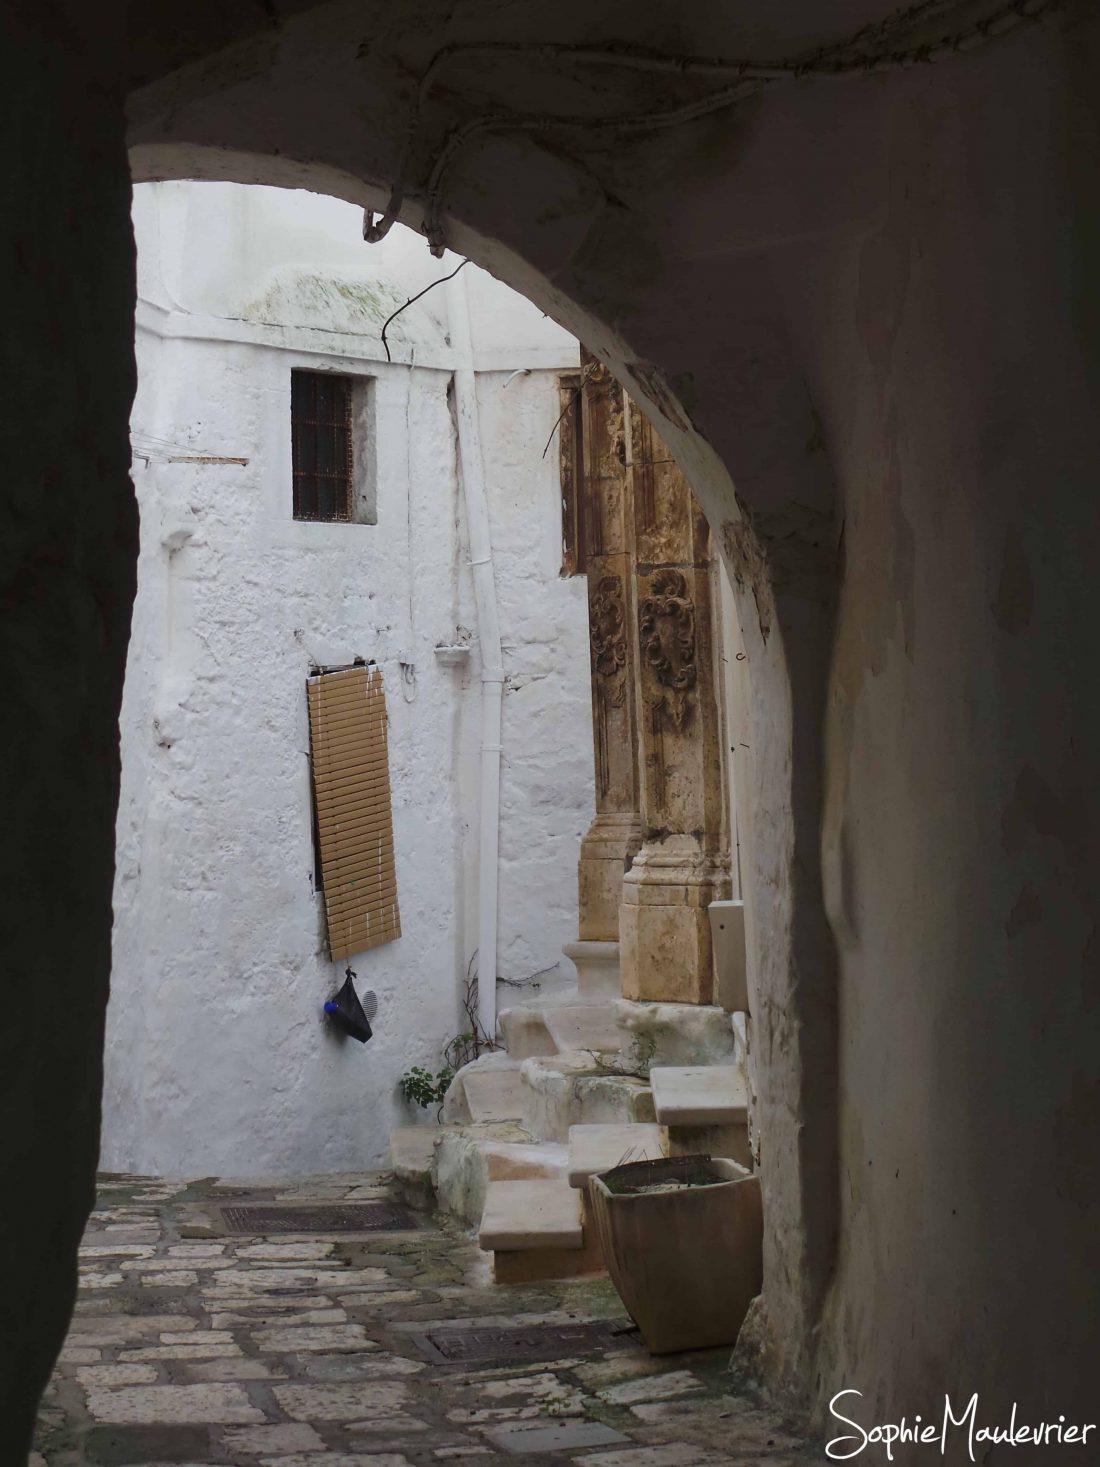 Old town Ostuni, Puglia, Italy